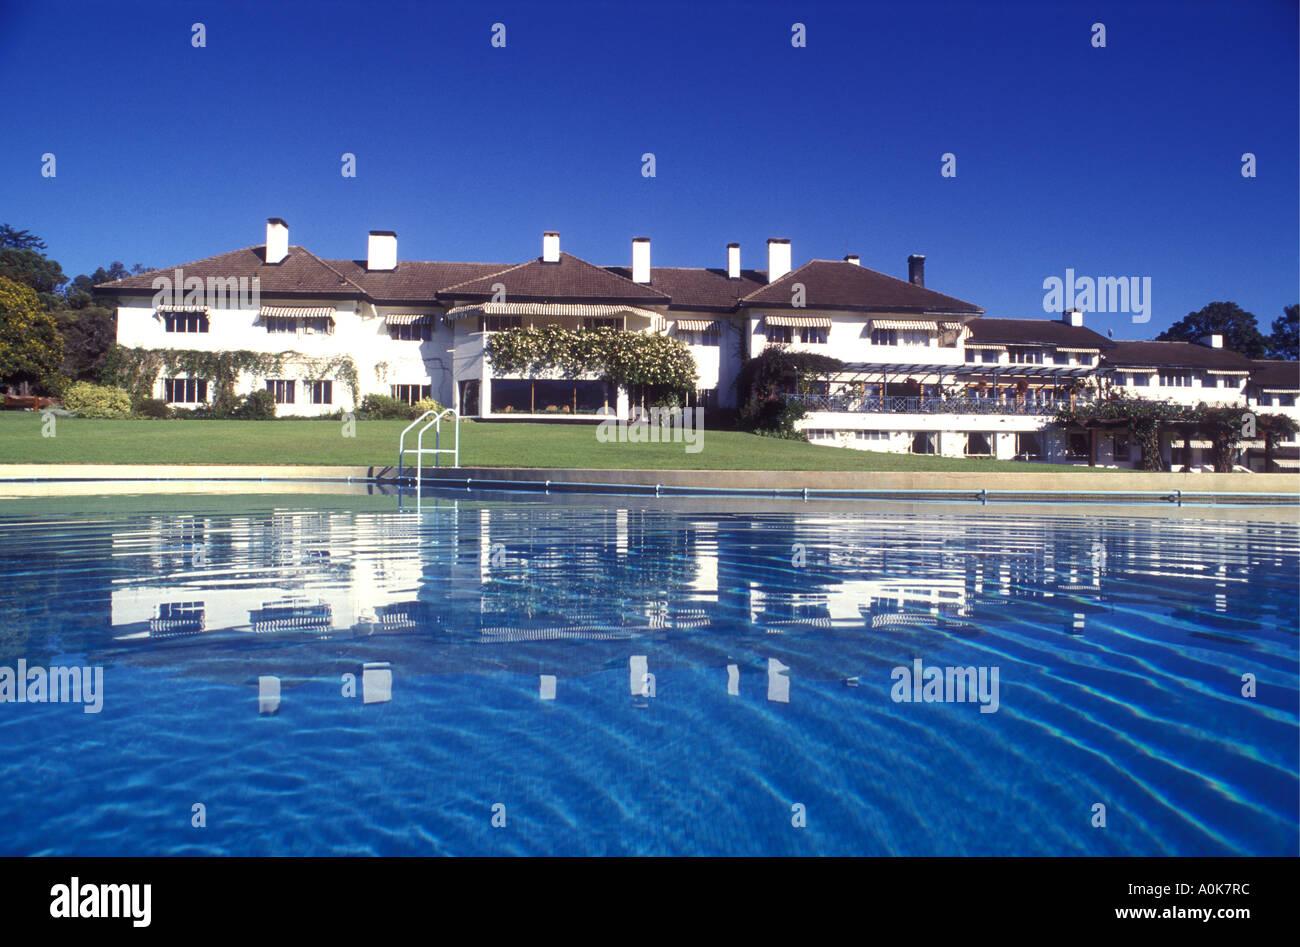 Tourism nanyuki stock photos tourism nanyuki stock - Cost of building a swimming pool in kenya ...